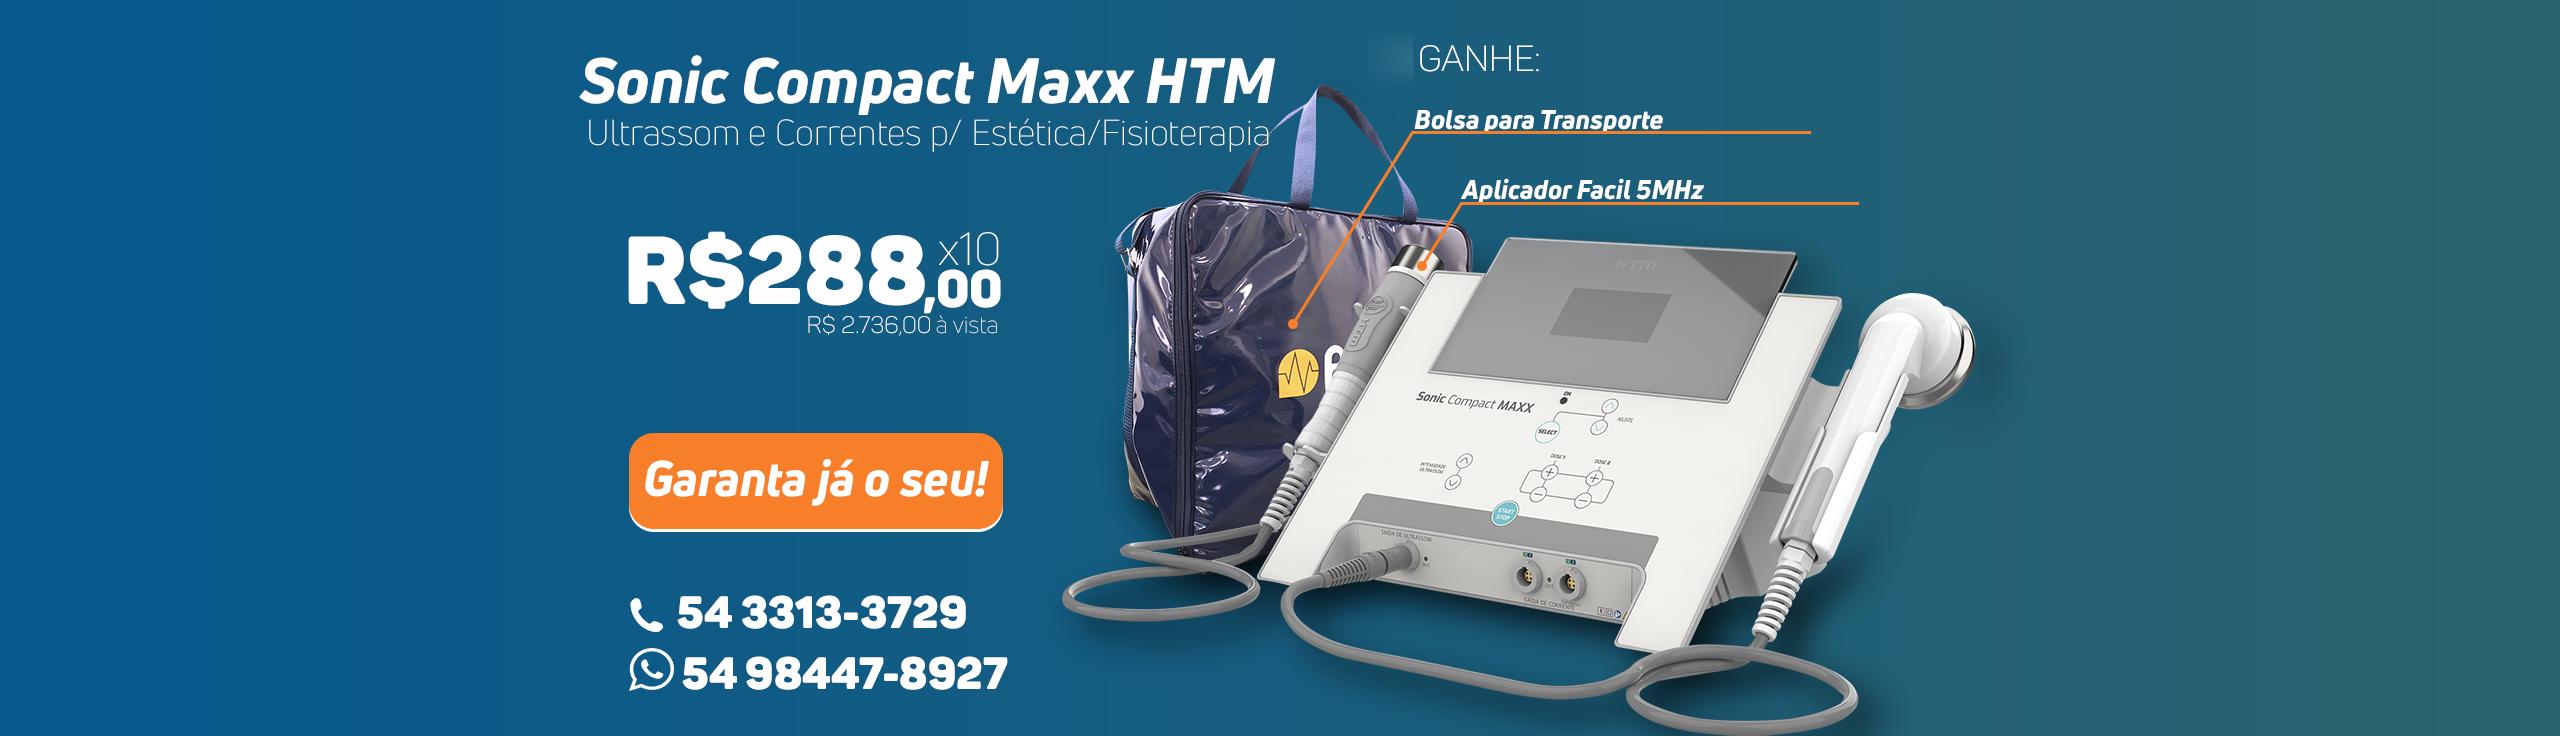 Sonic Compact Maxx